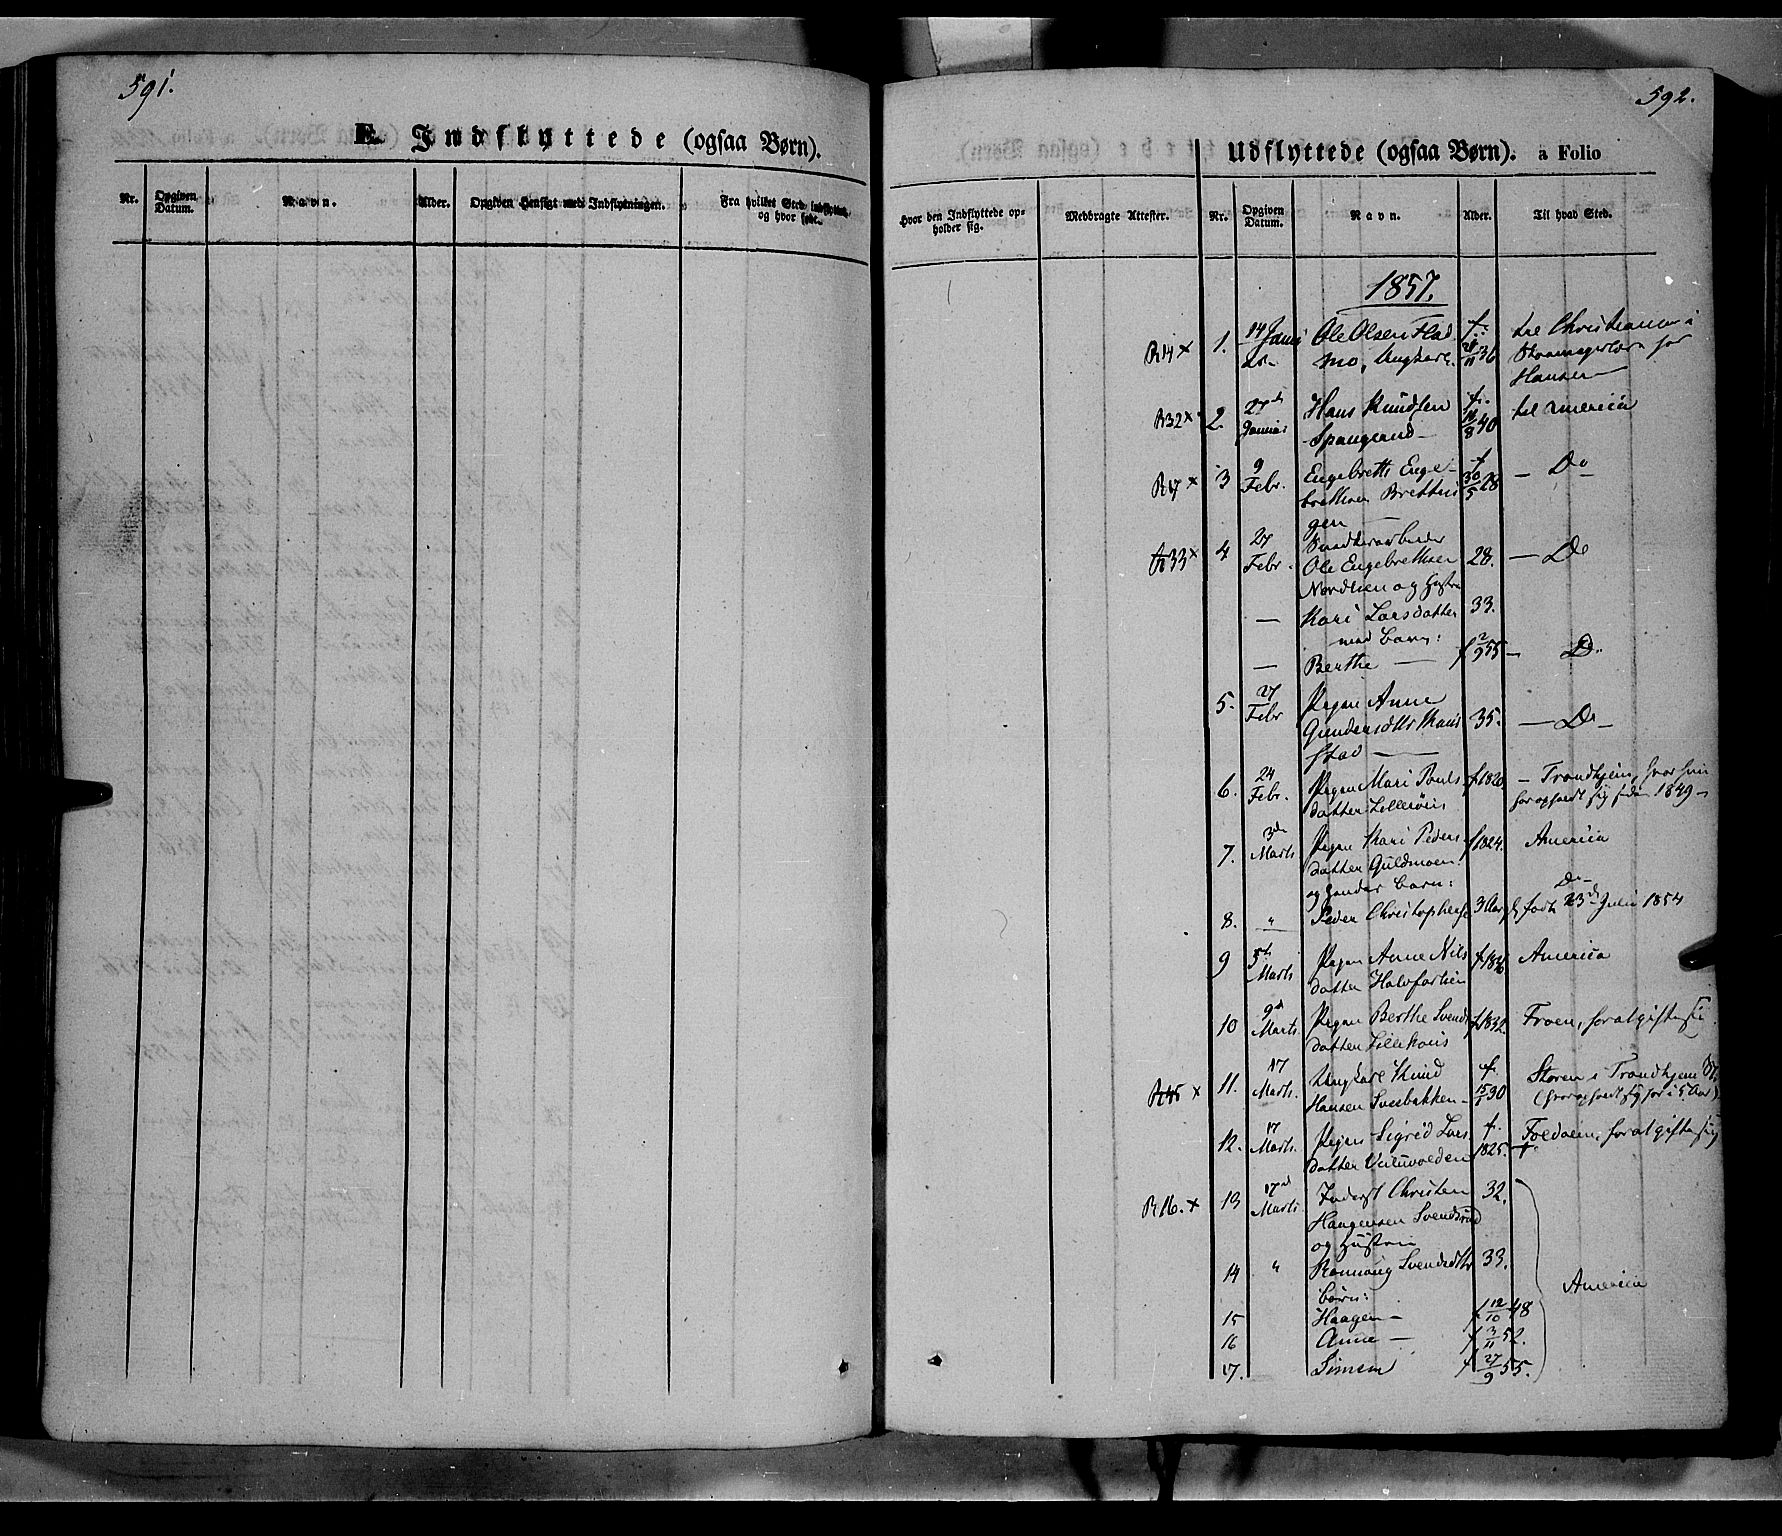 SAH, Ringebu prestekontor, Ministerialbok nr. 6, 1848-1859, s. 591-592